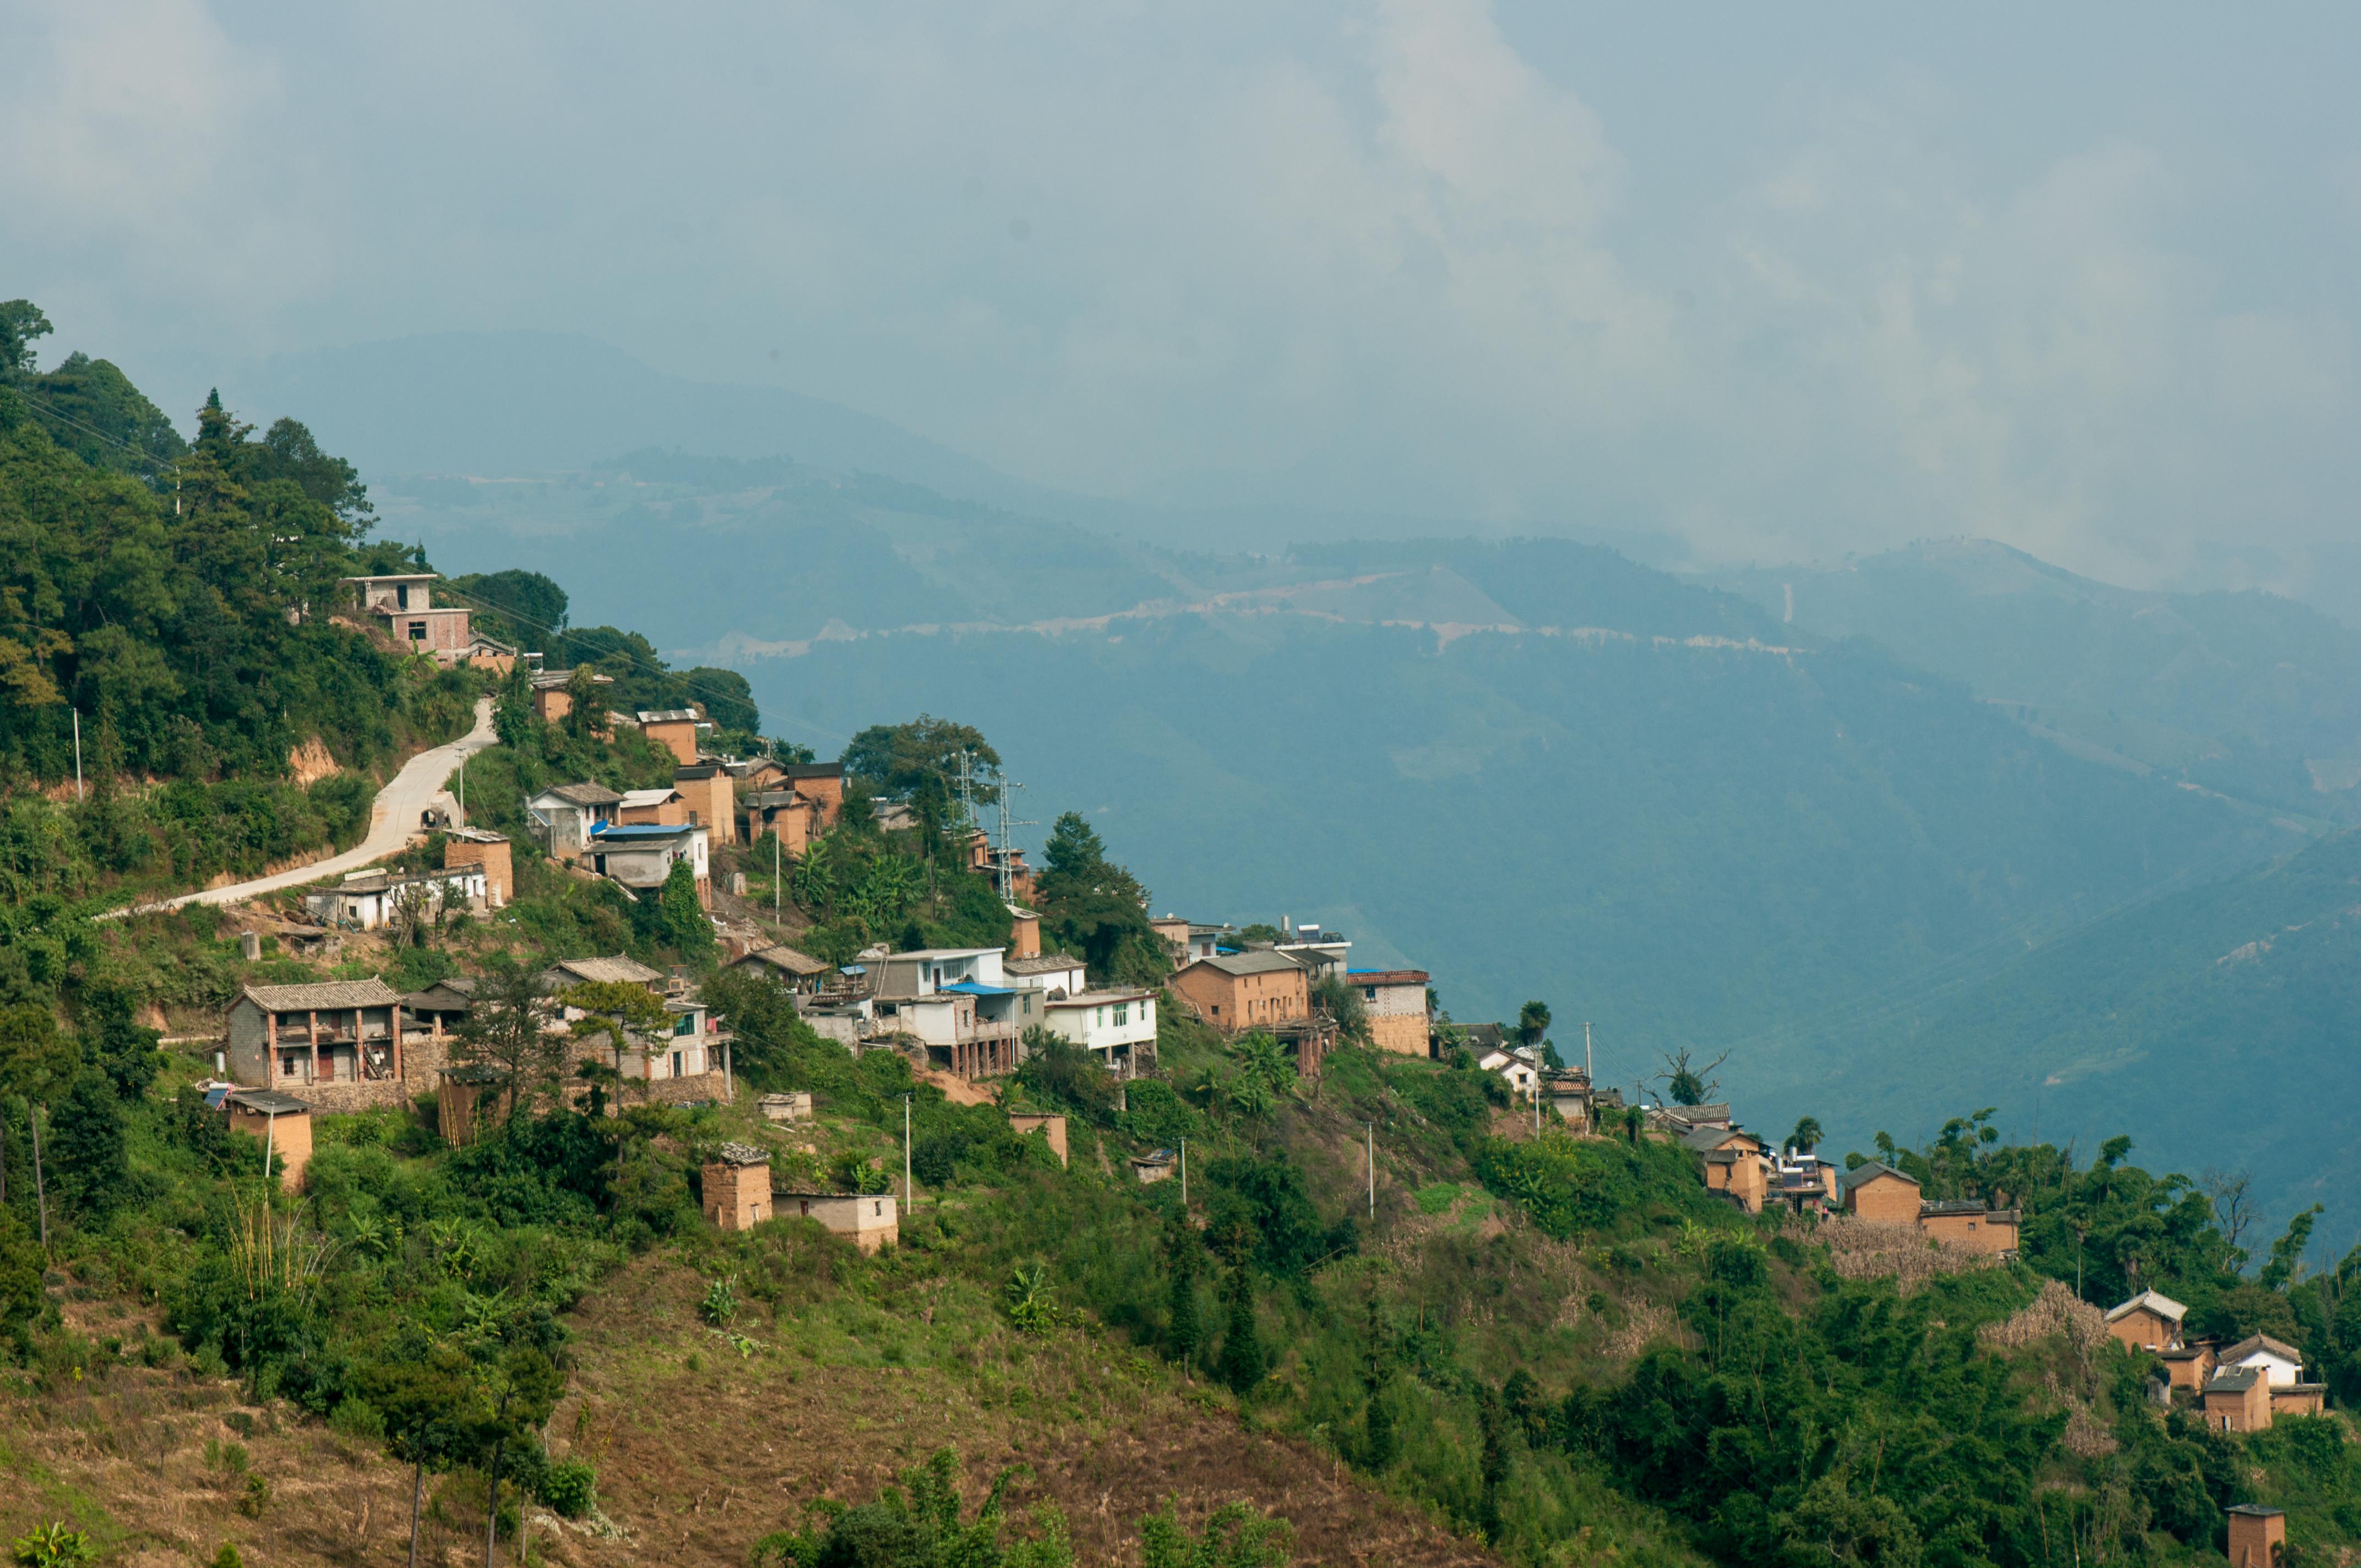 Pakistani Village Photos (With images) | Village photos